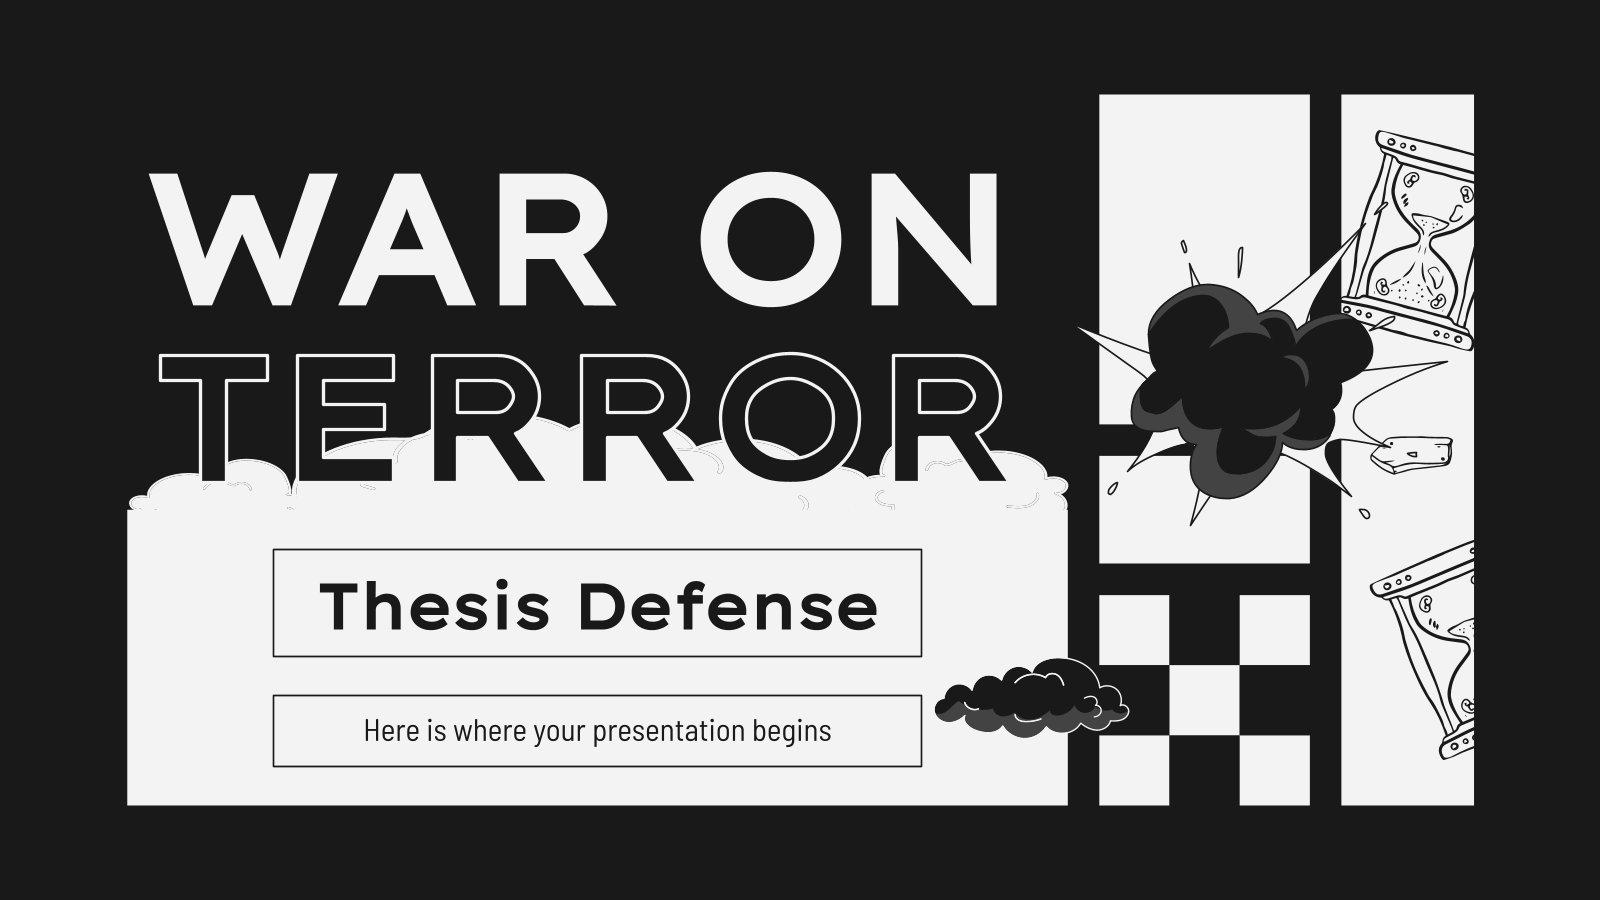 War on Terror Thesis Defense presentation template